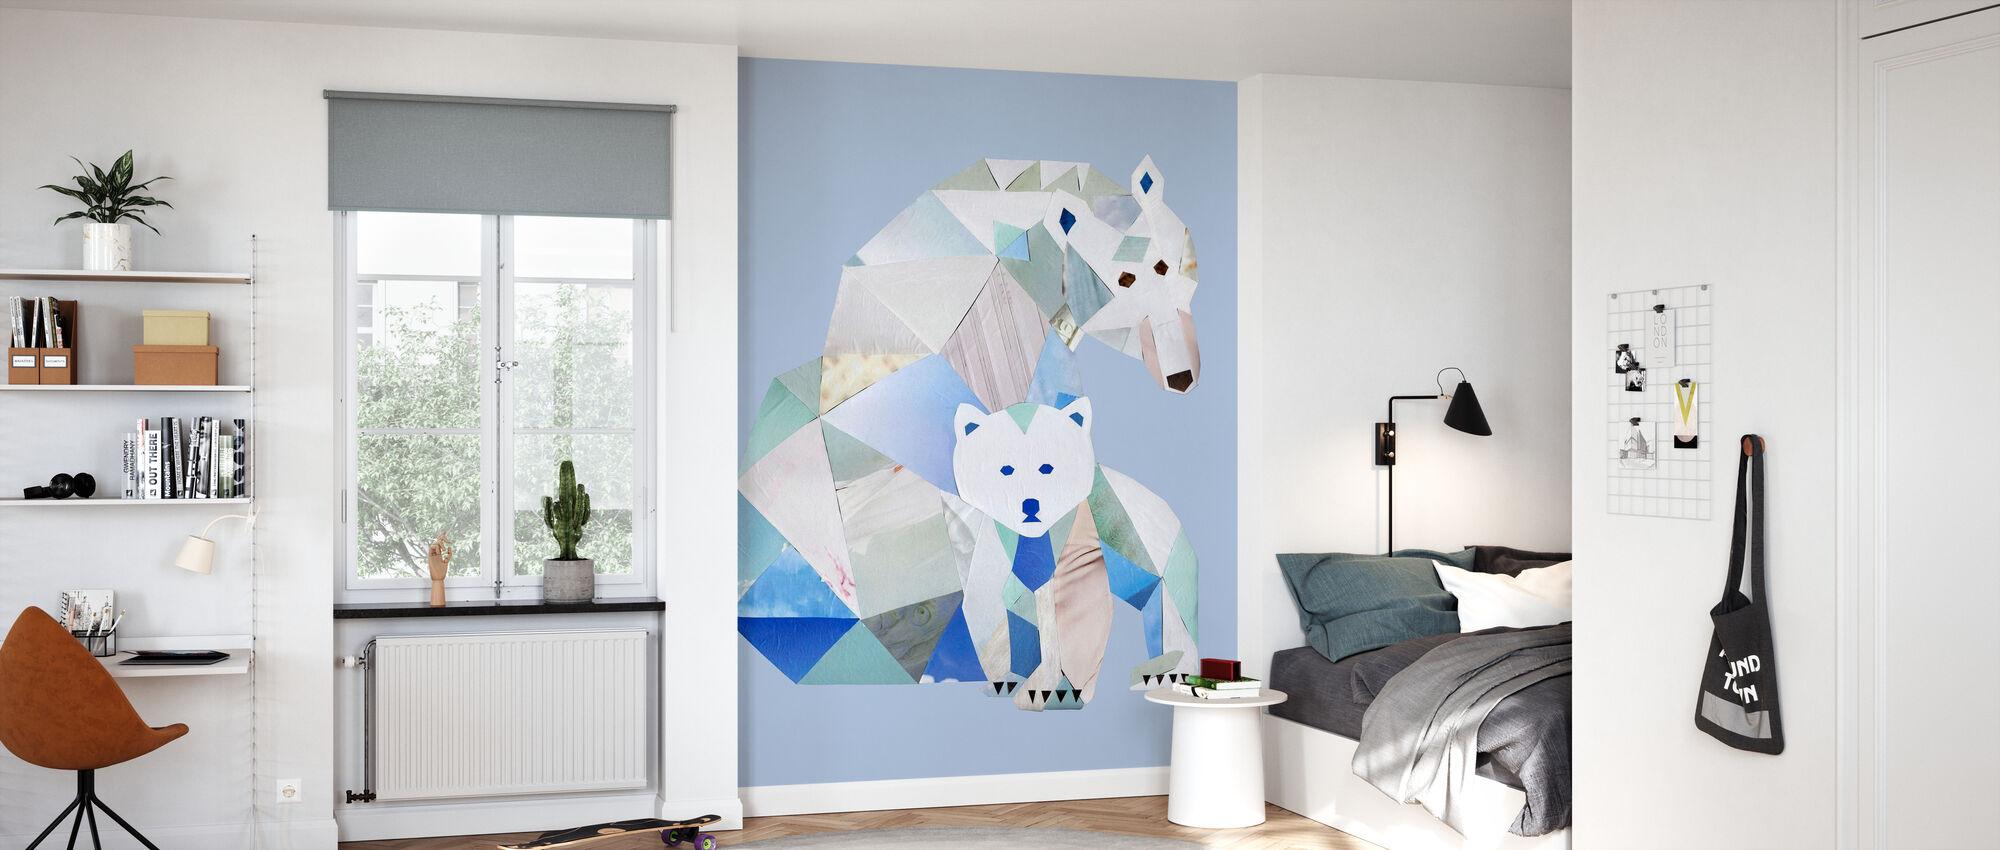 Polar Bears Gray - Wallpaper - Kids Room